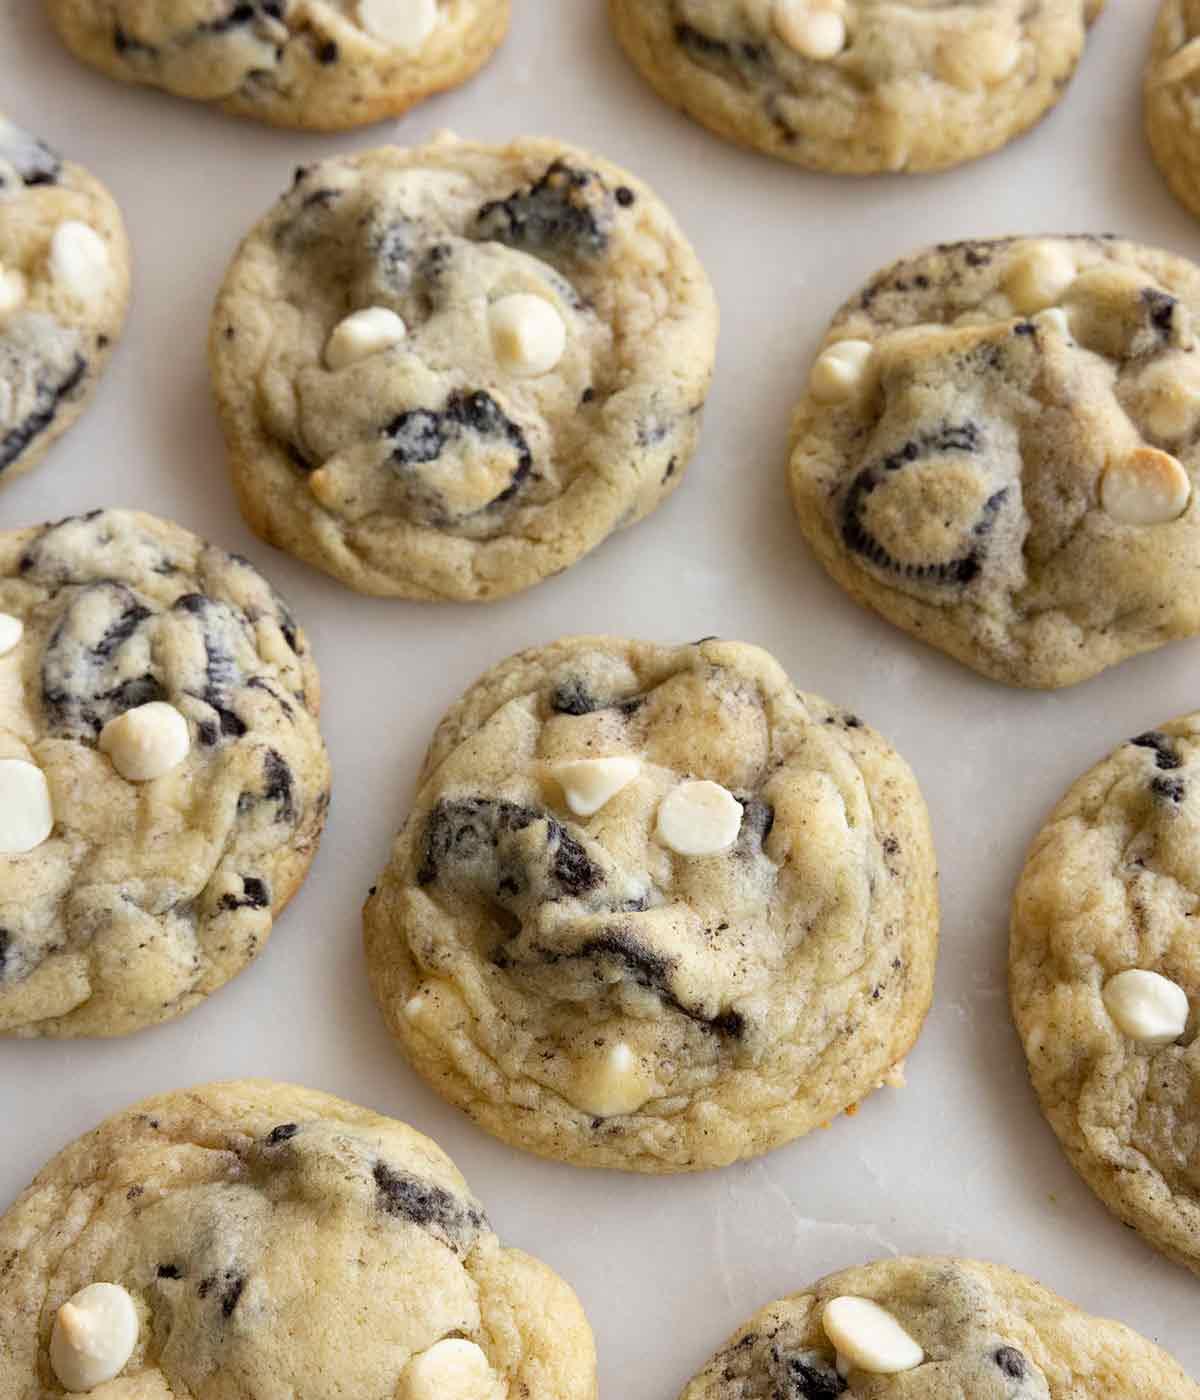 Overhead view of multiple cookies and cream cookies.